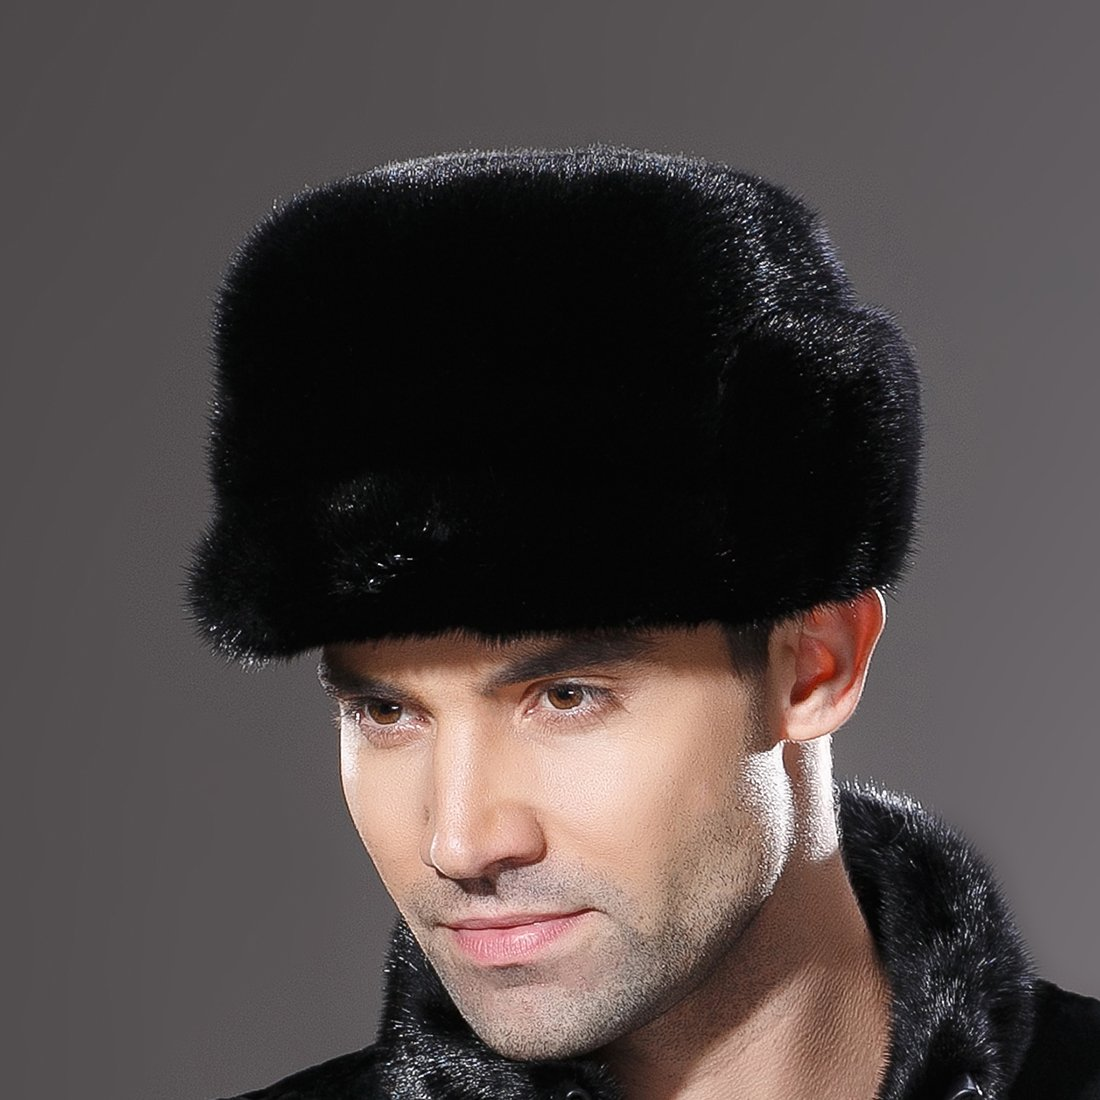 URSFUR Mne's Winter Fur Cap Genuine Mink Fur Fudd Hat Black M by URSFUR (Image #7)